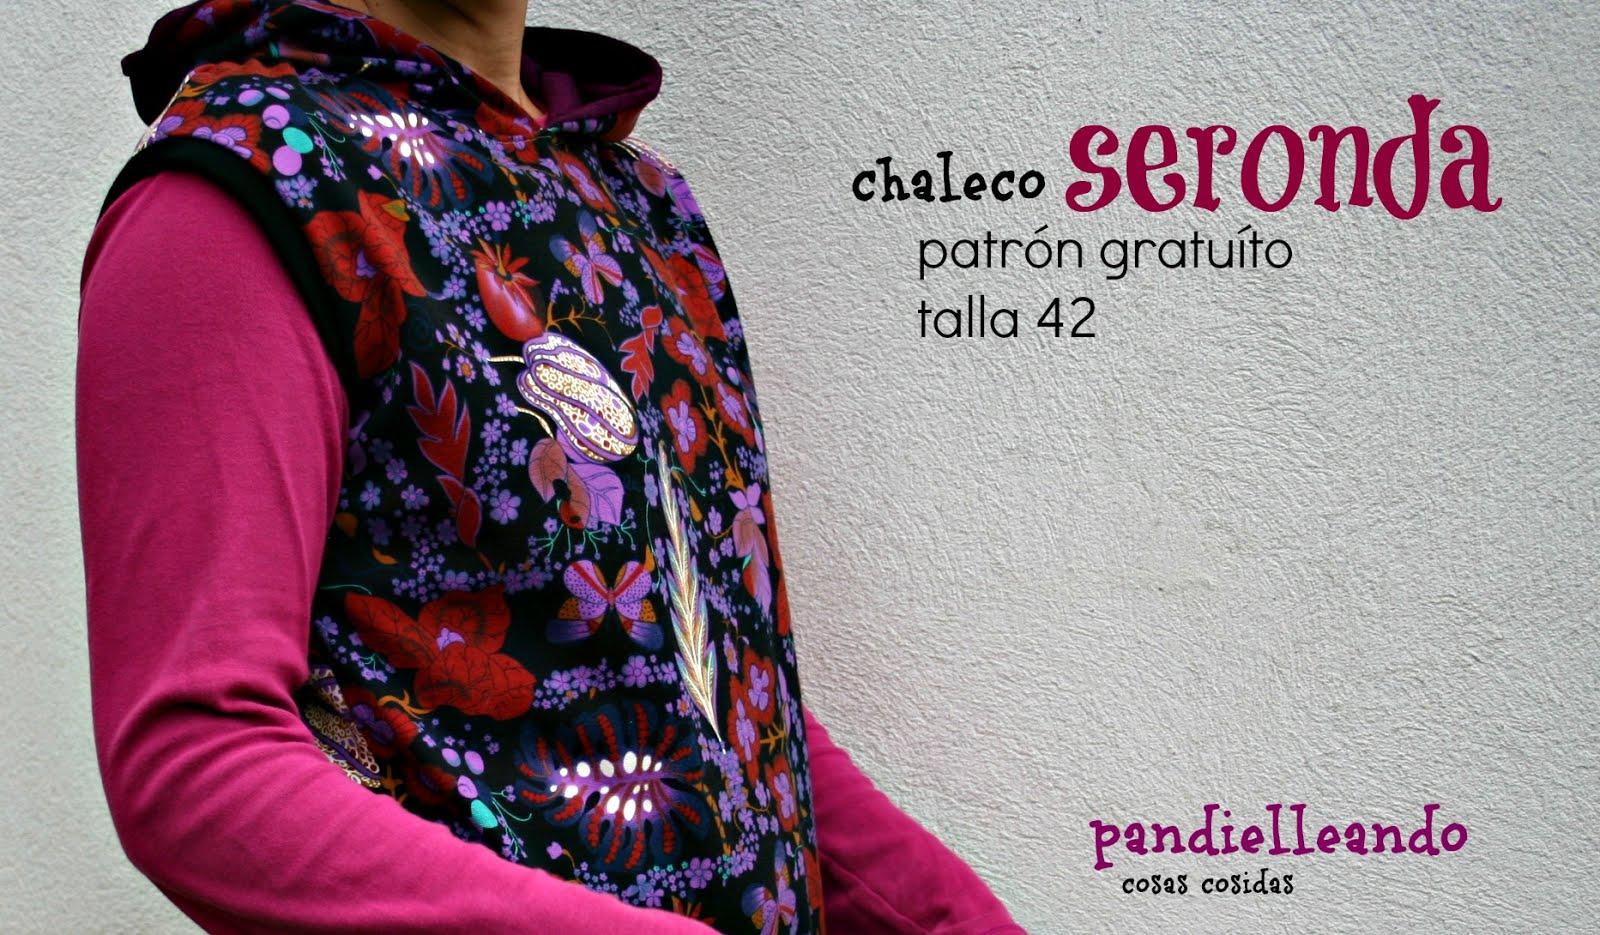 Chaleco Seronda